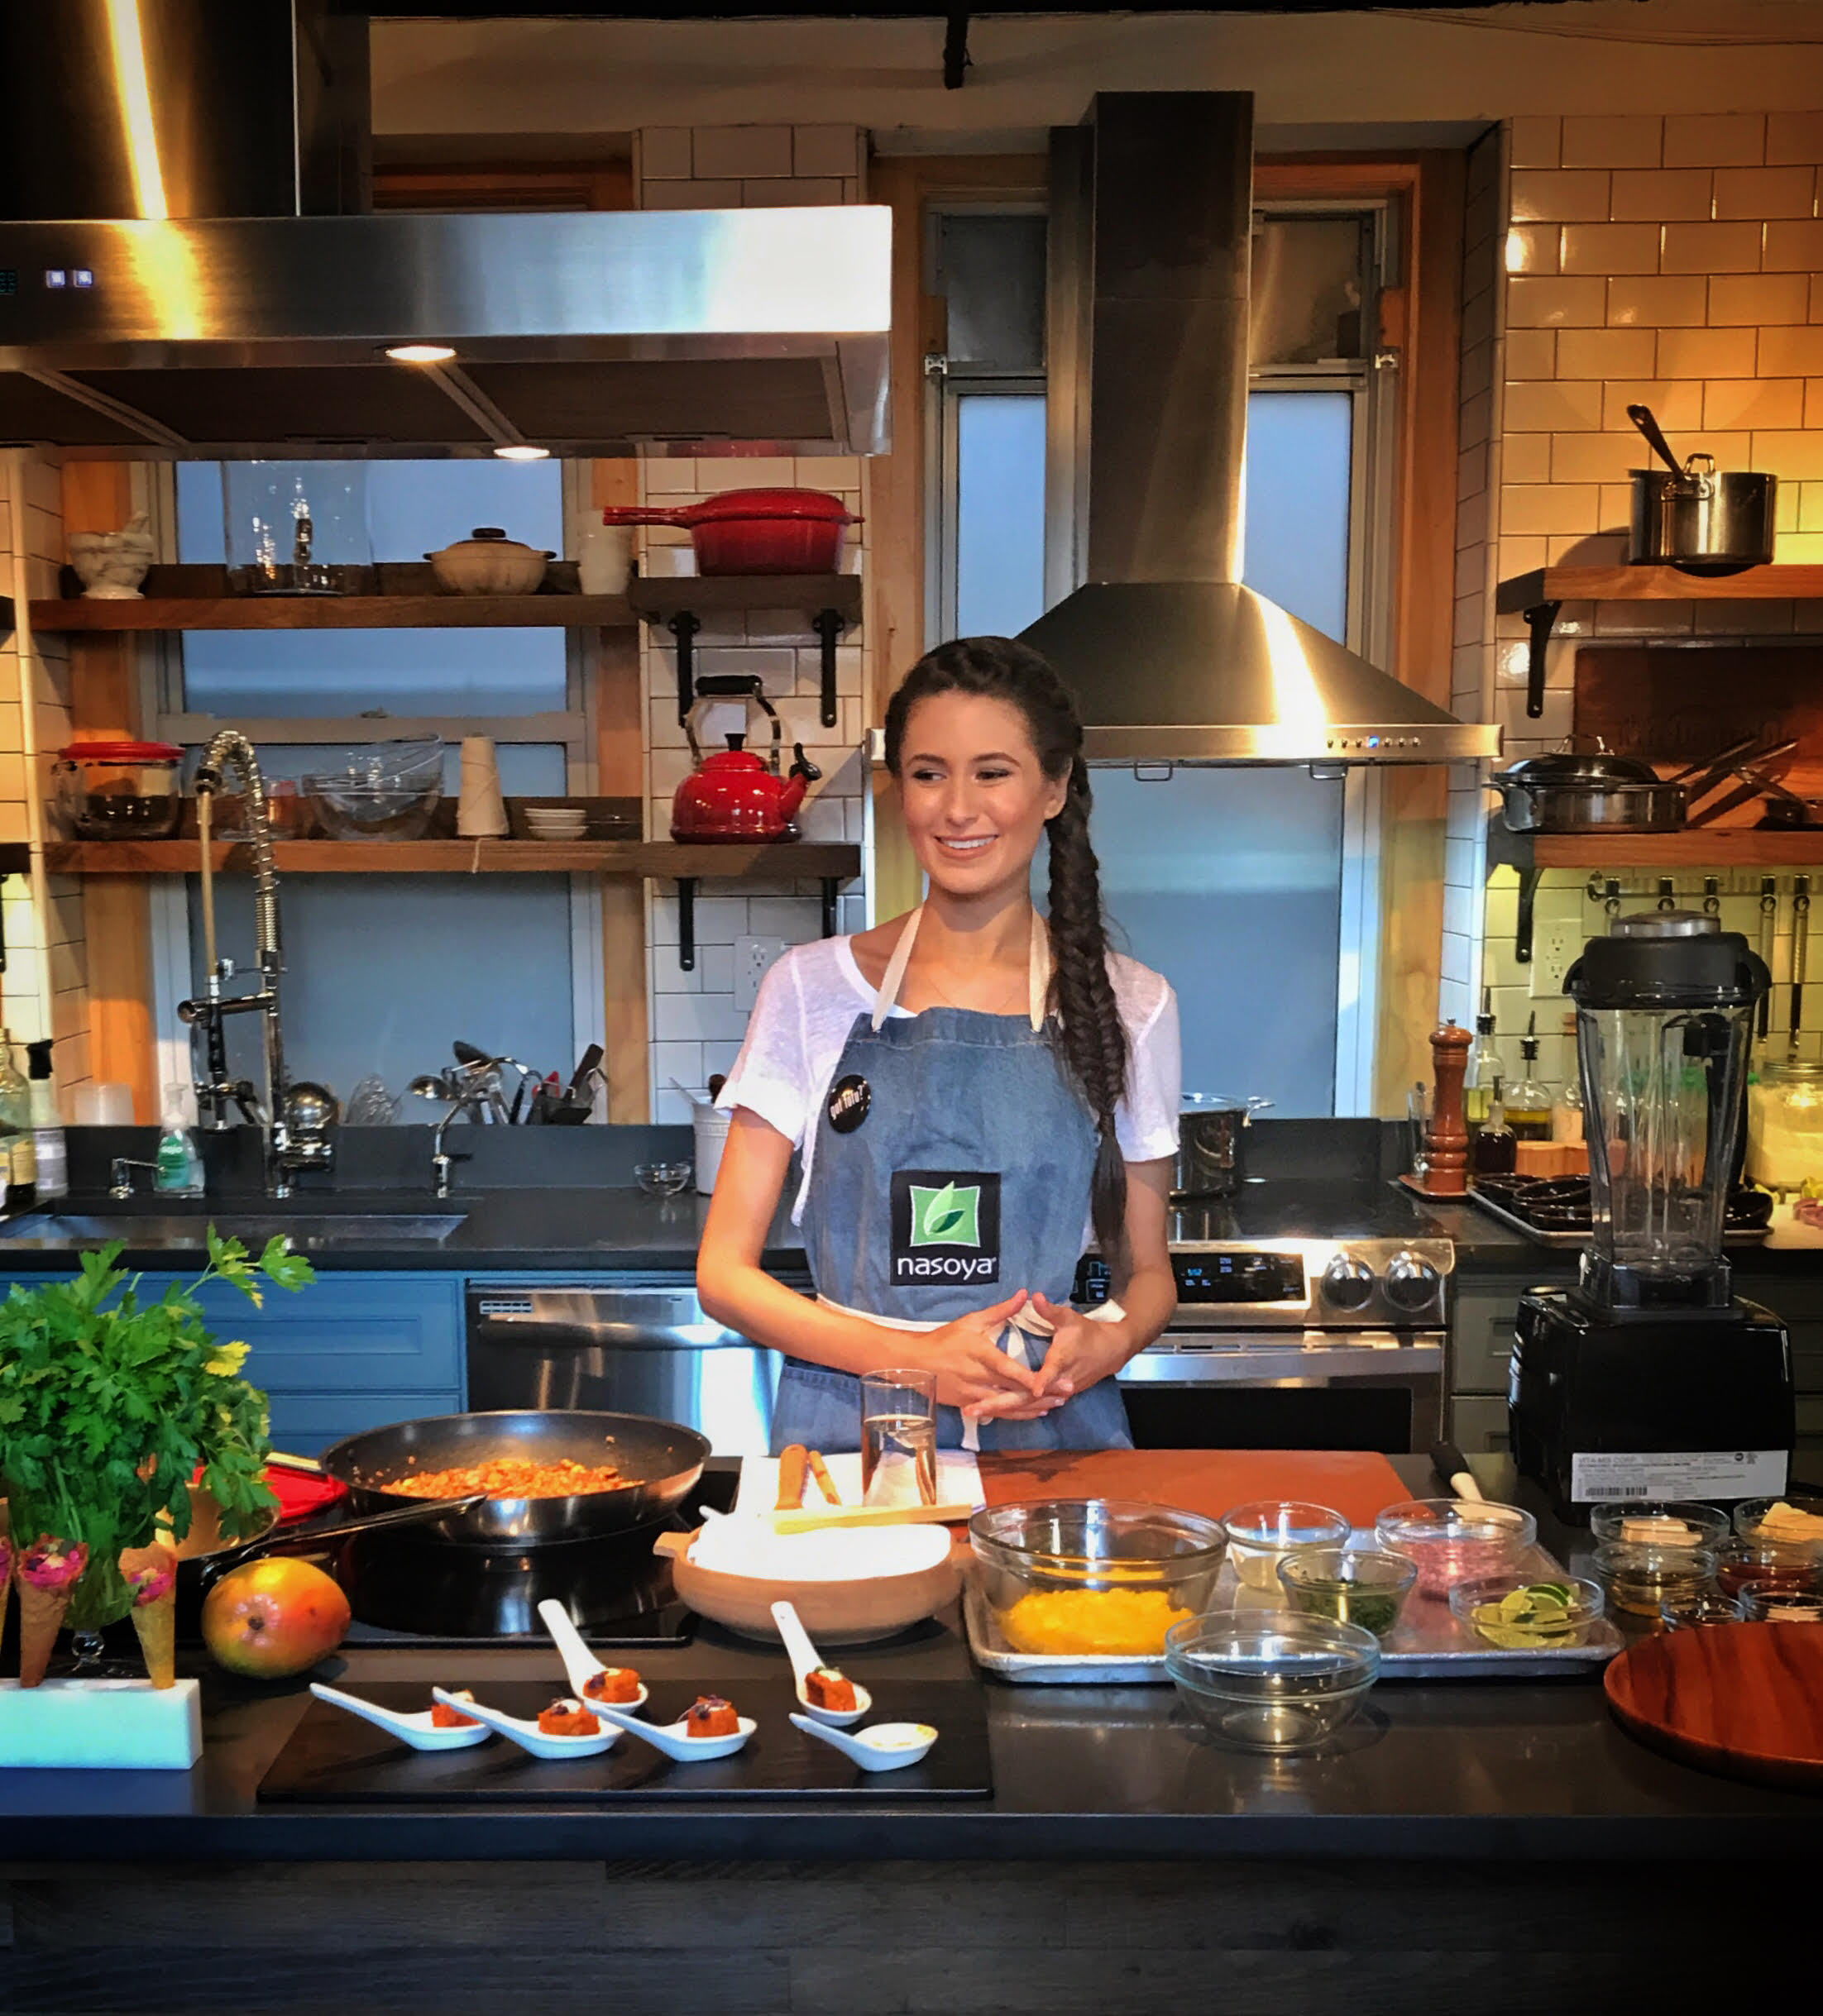 Chef Chloe Coscarelli